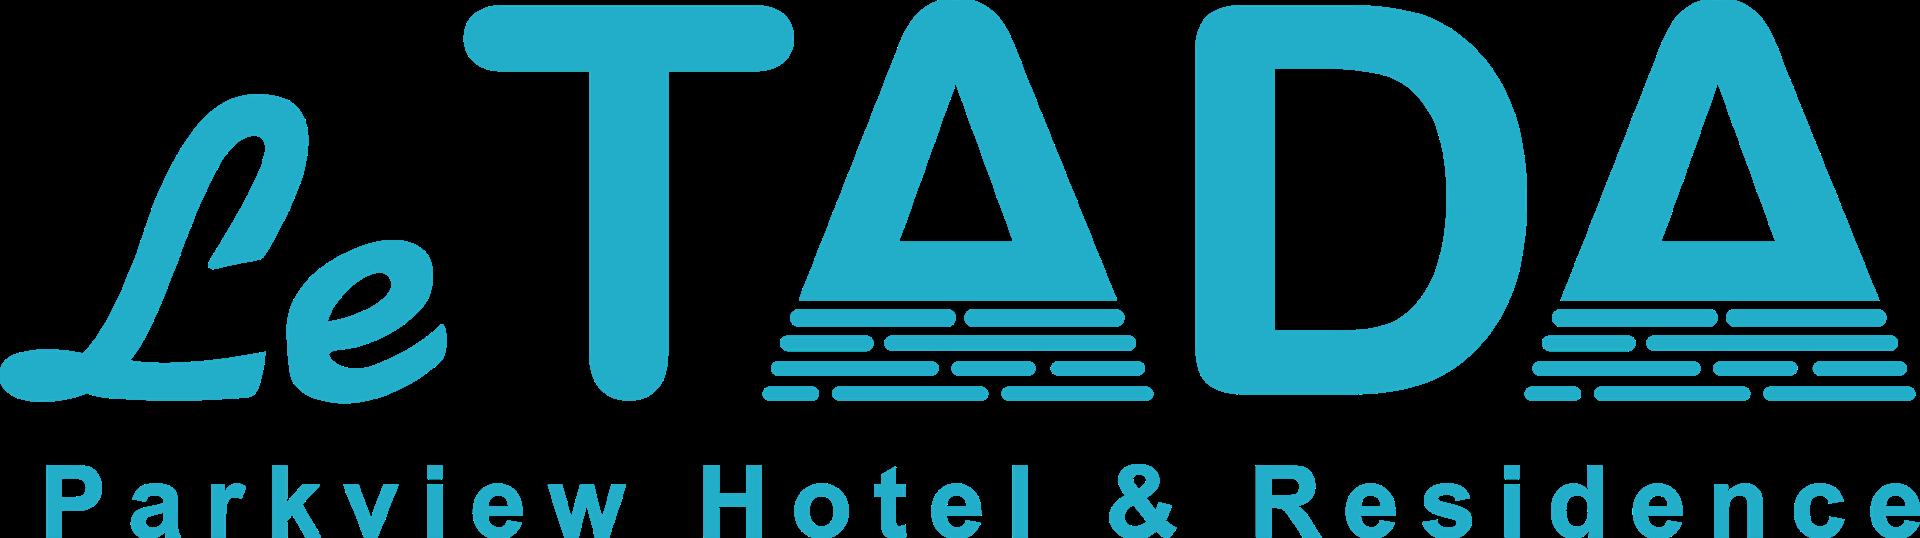 Le Tada Parkview Hotel